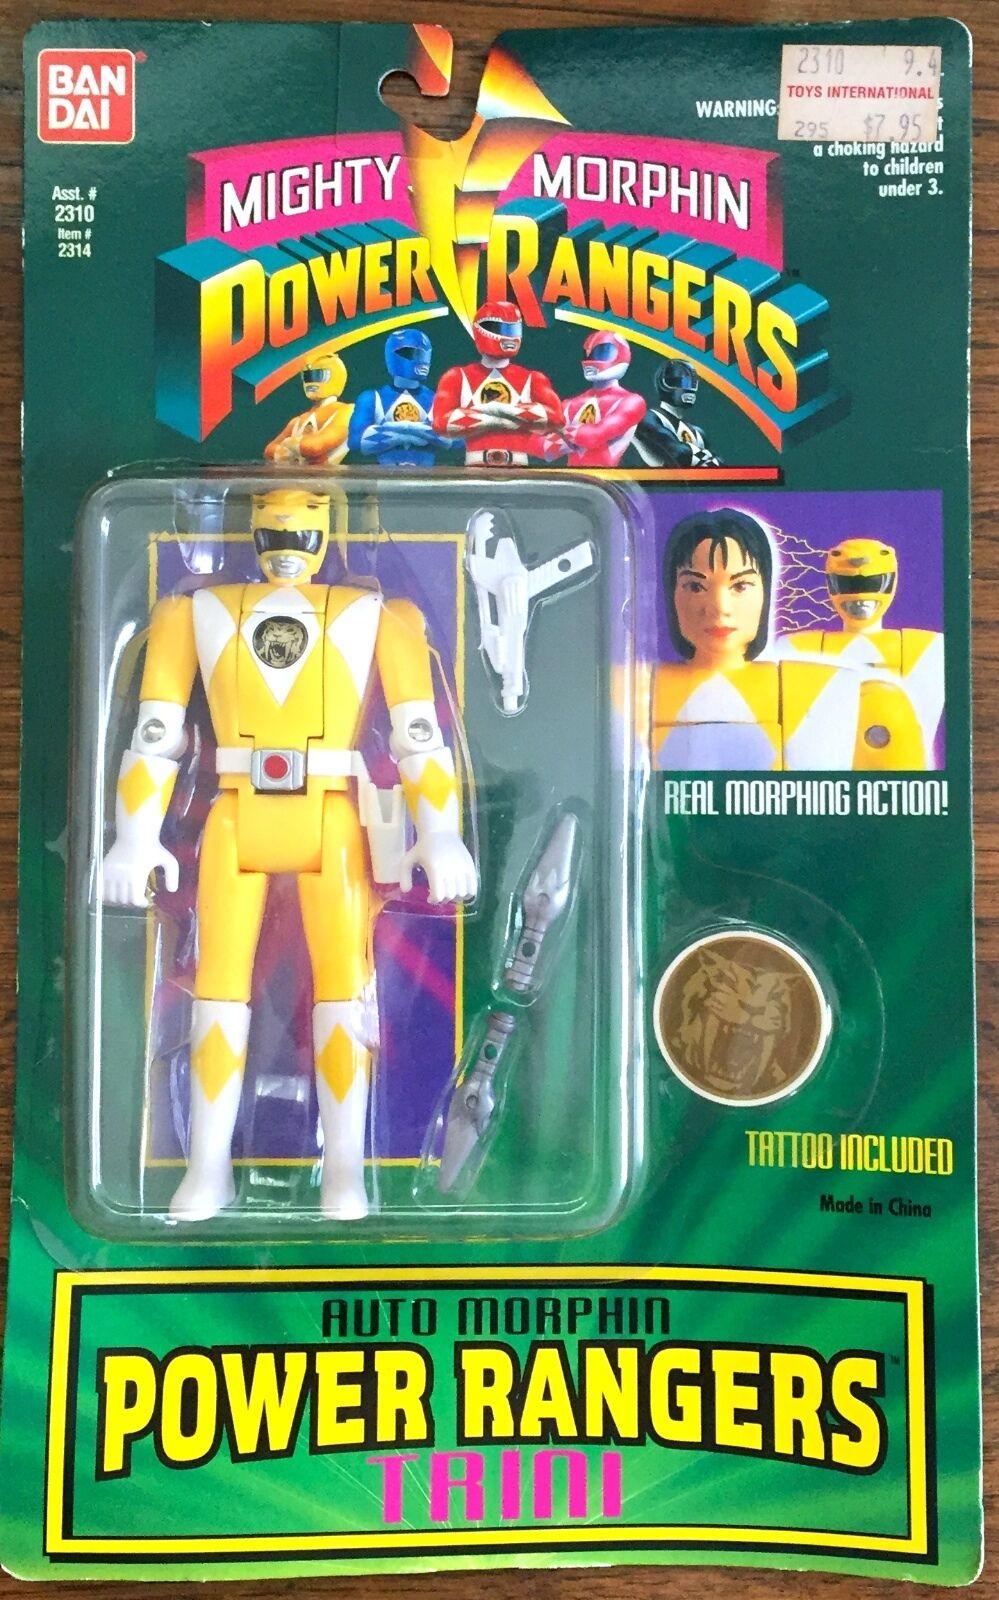 1994 Mighty Morphin Power Power Power Rangers Trini Toy Action Figure New, Bandai MOC b20e0c